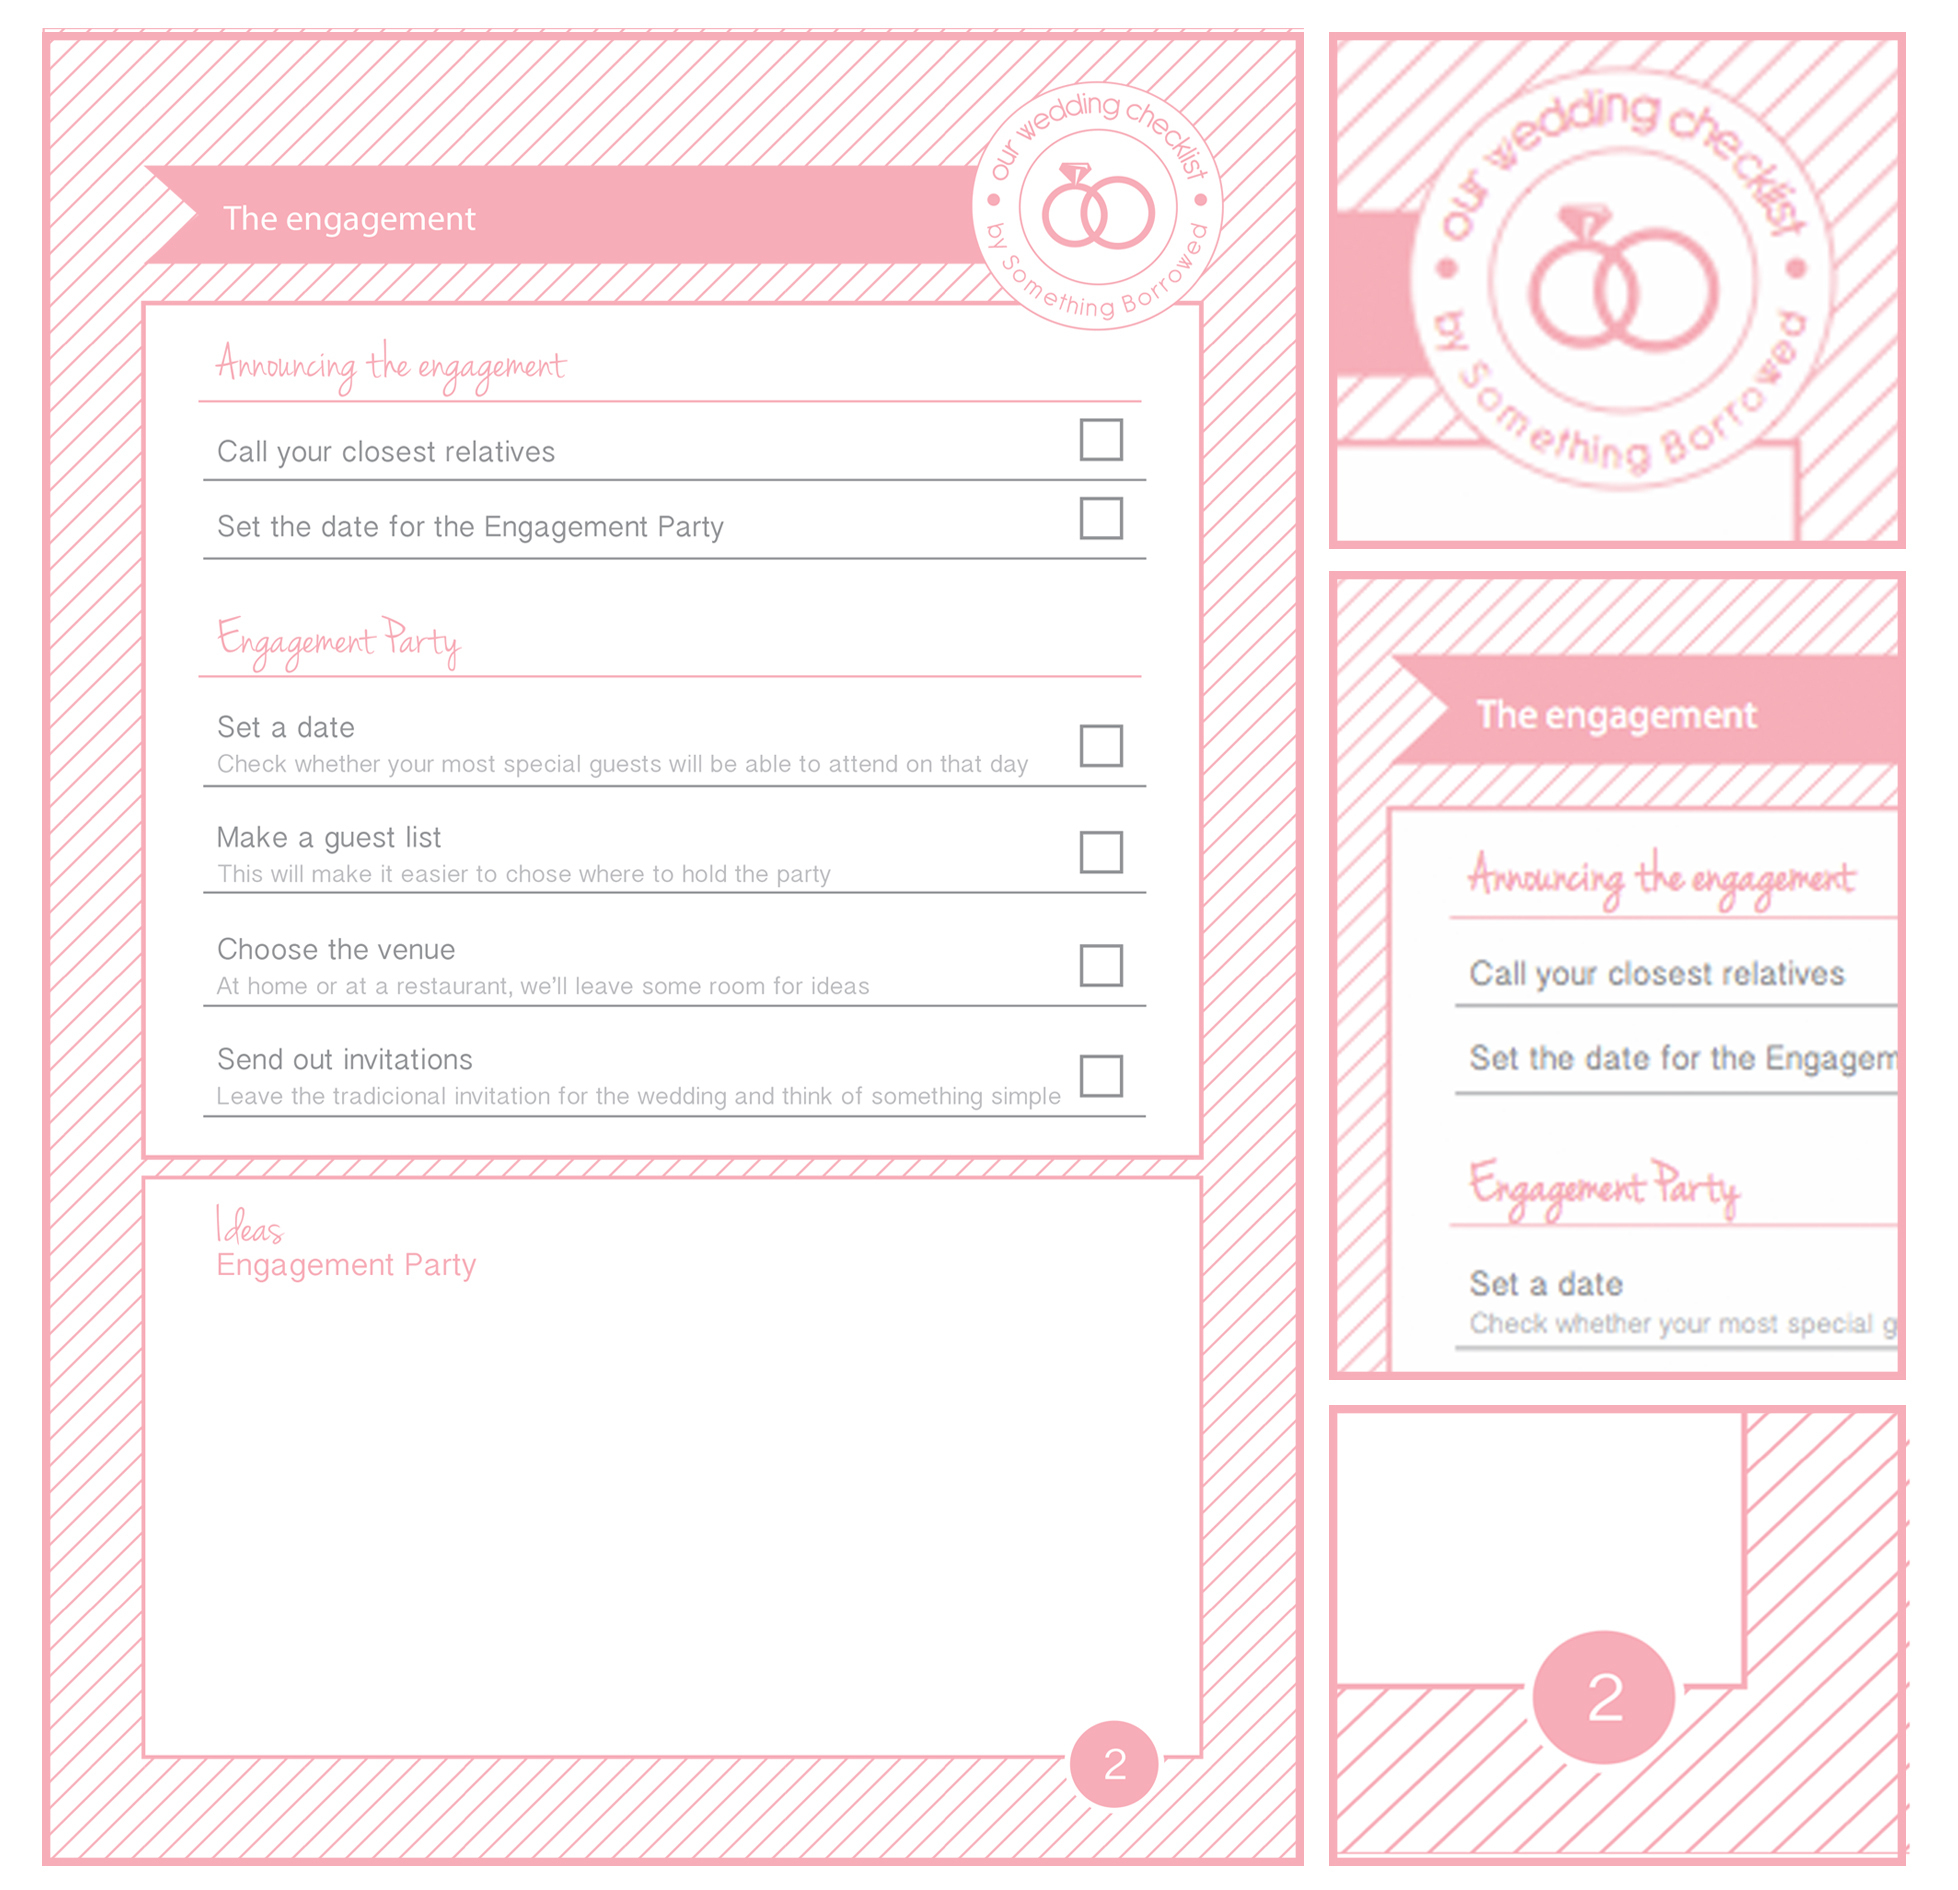 Free Printable Wedding Planner Book Online – Free Wedding Template - Free Printable Wedding Planner Book Online